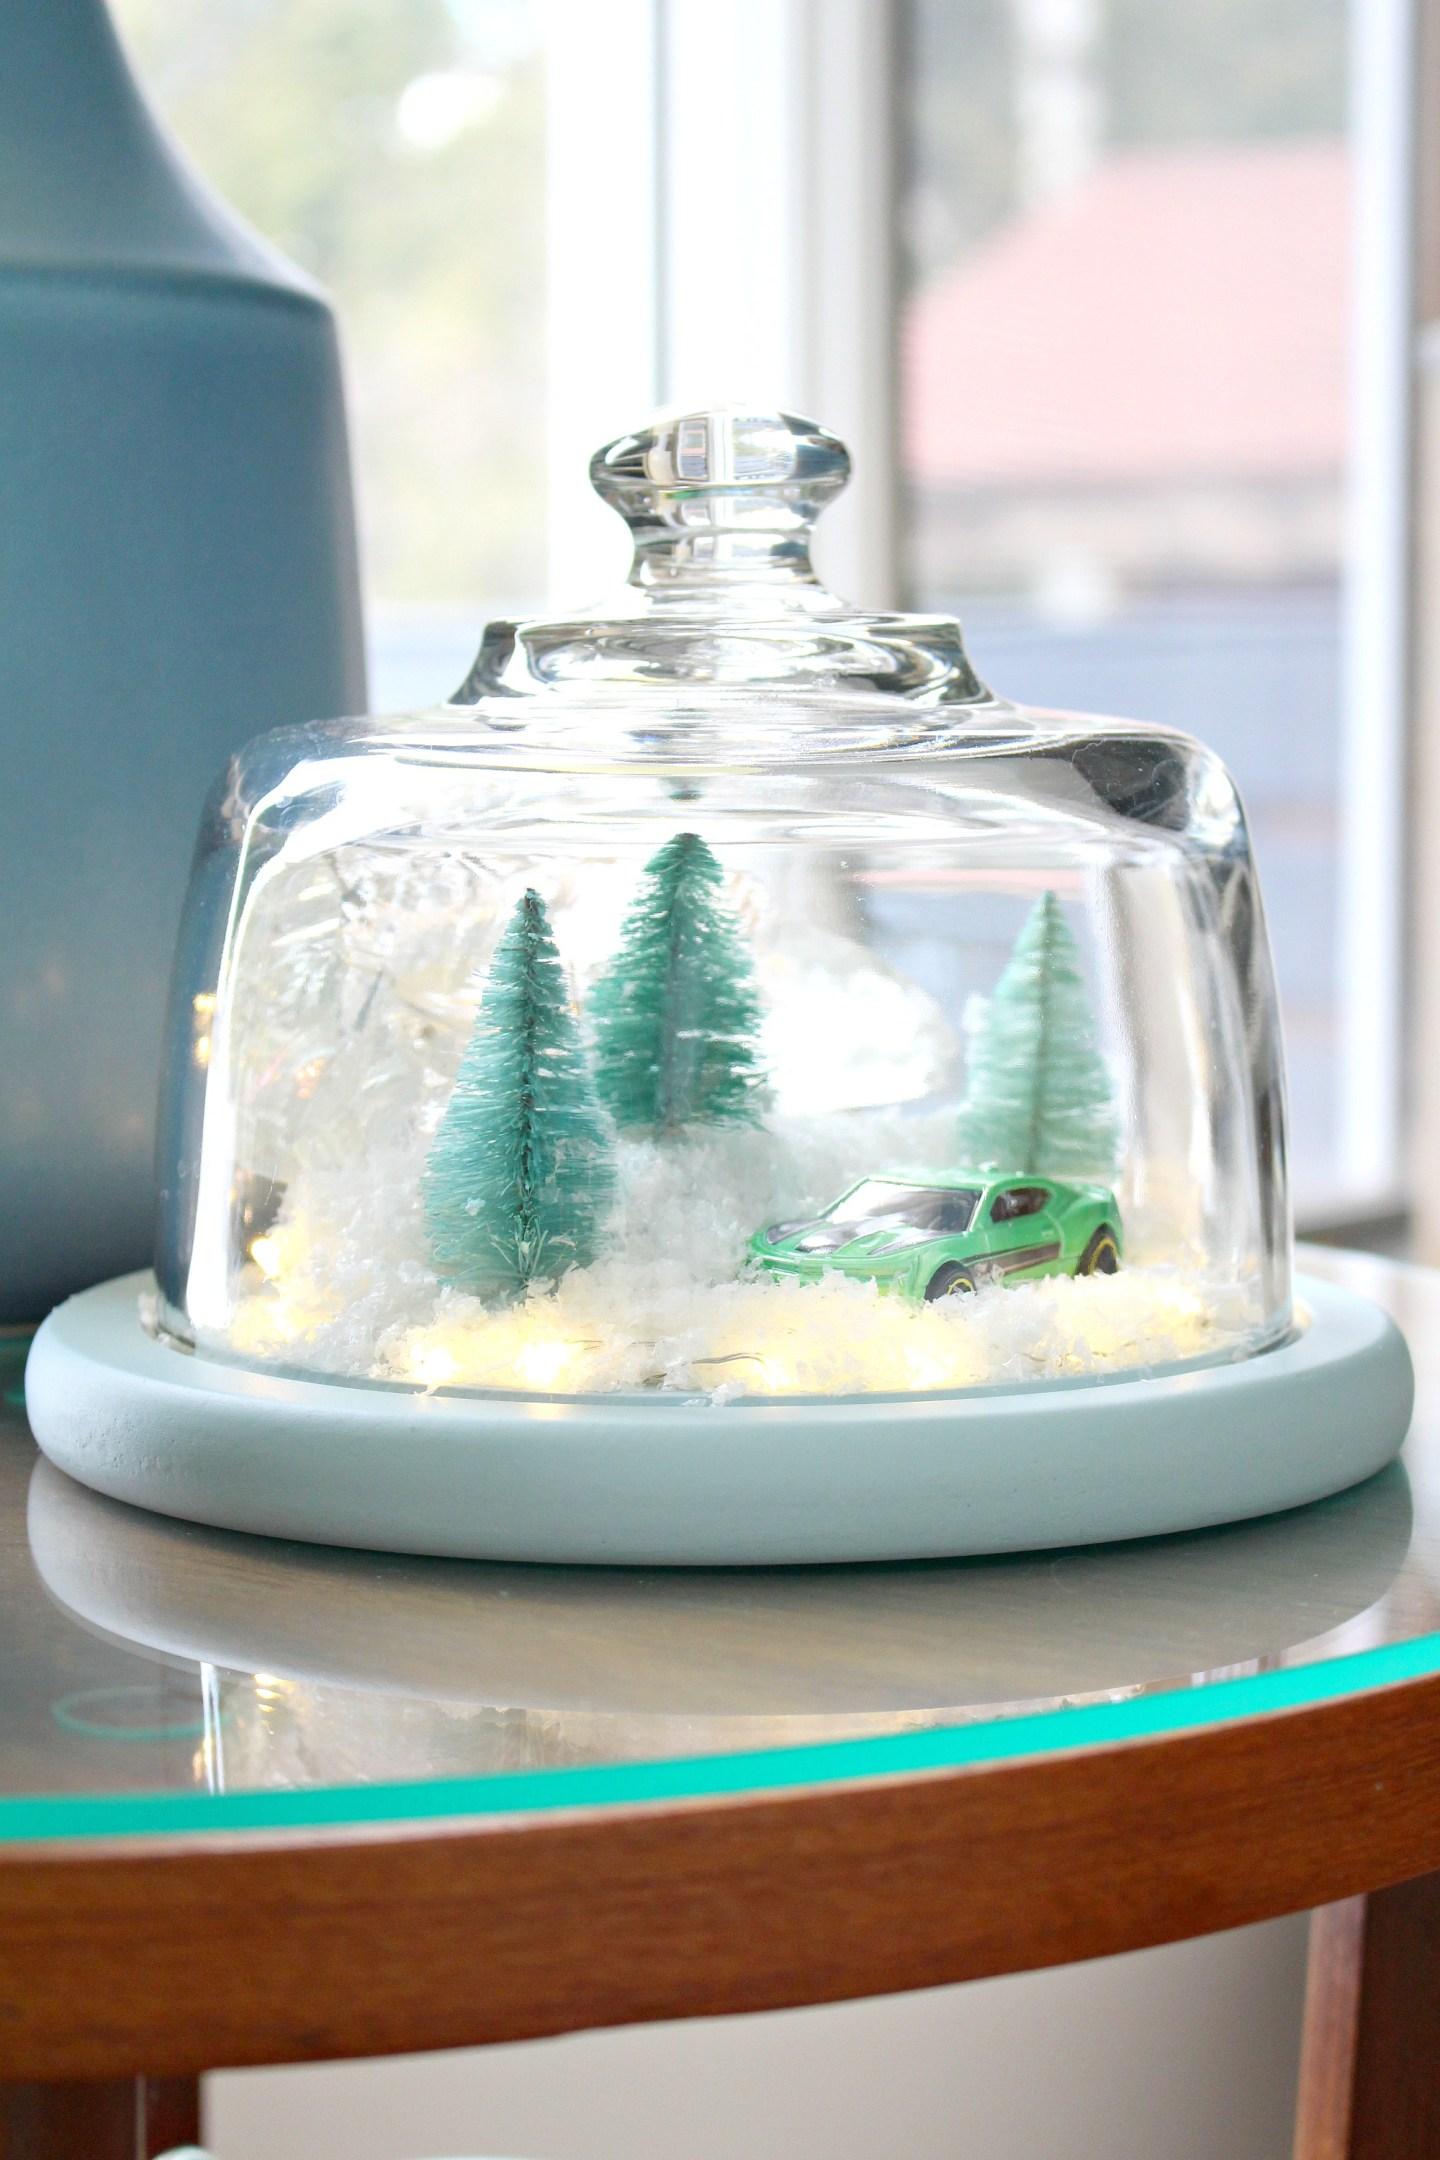 DIY Winter Diorama | aka The Camaro Cloche. Make this easy winter decor using a thrifted cheese cloche. Camaro themed holiday decor, lol! #diy #holidaydecor